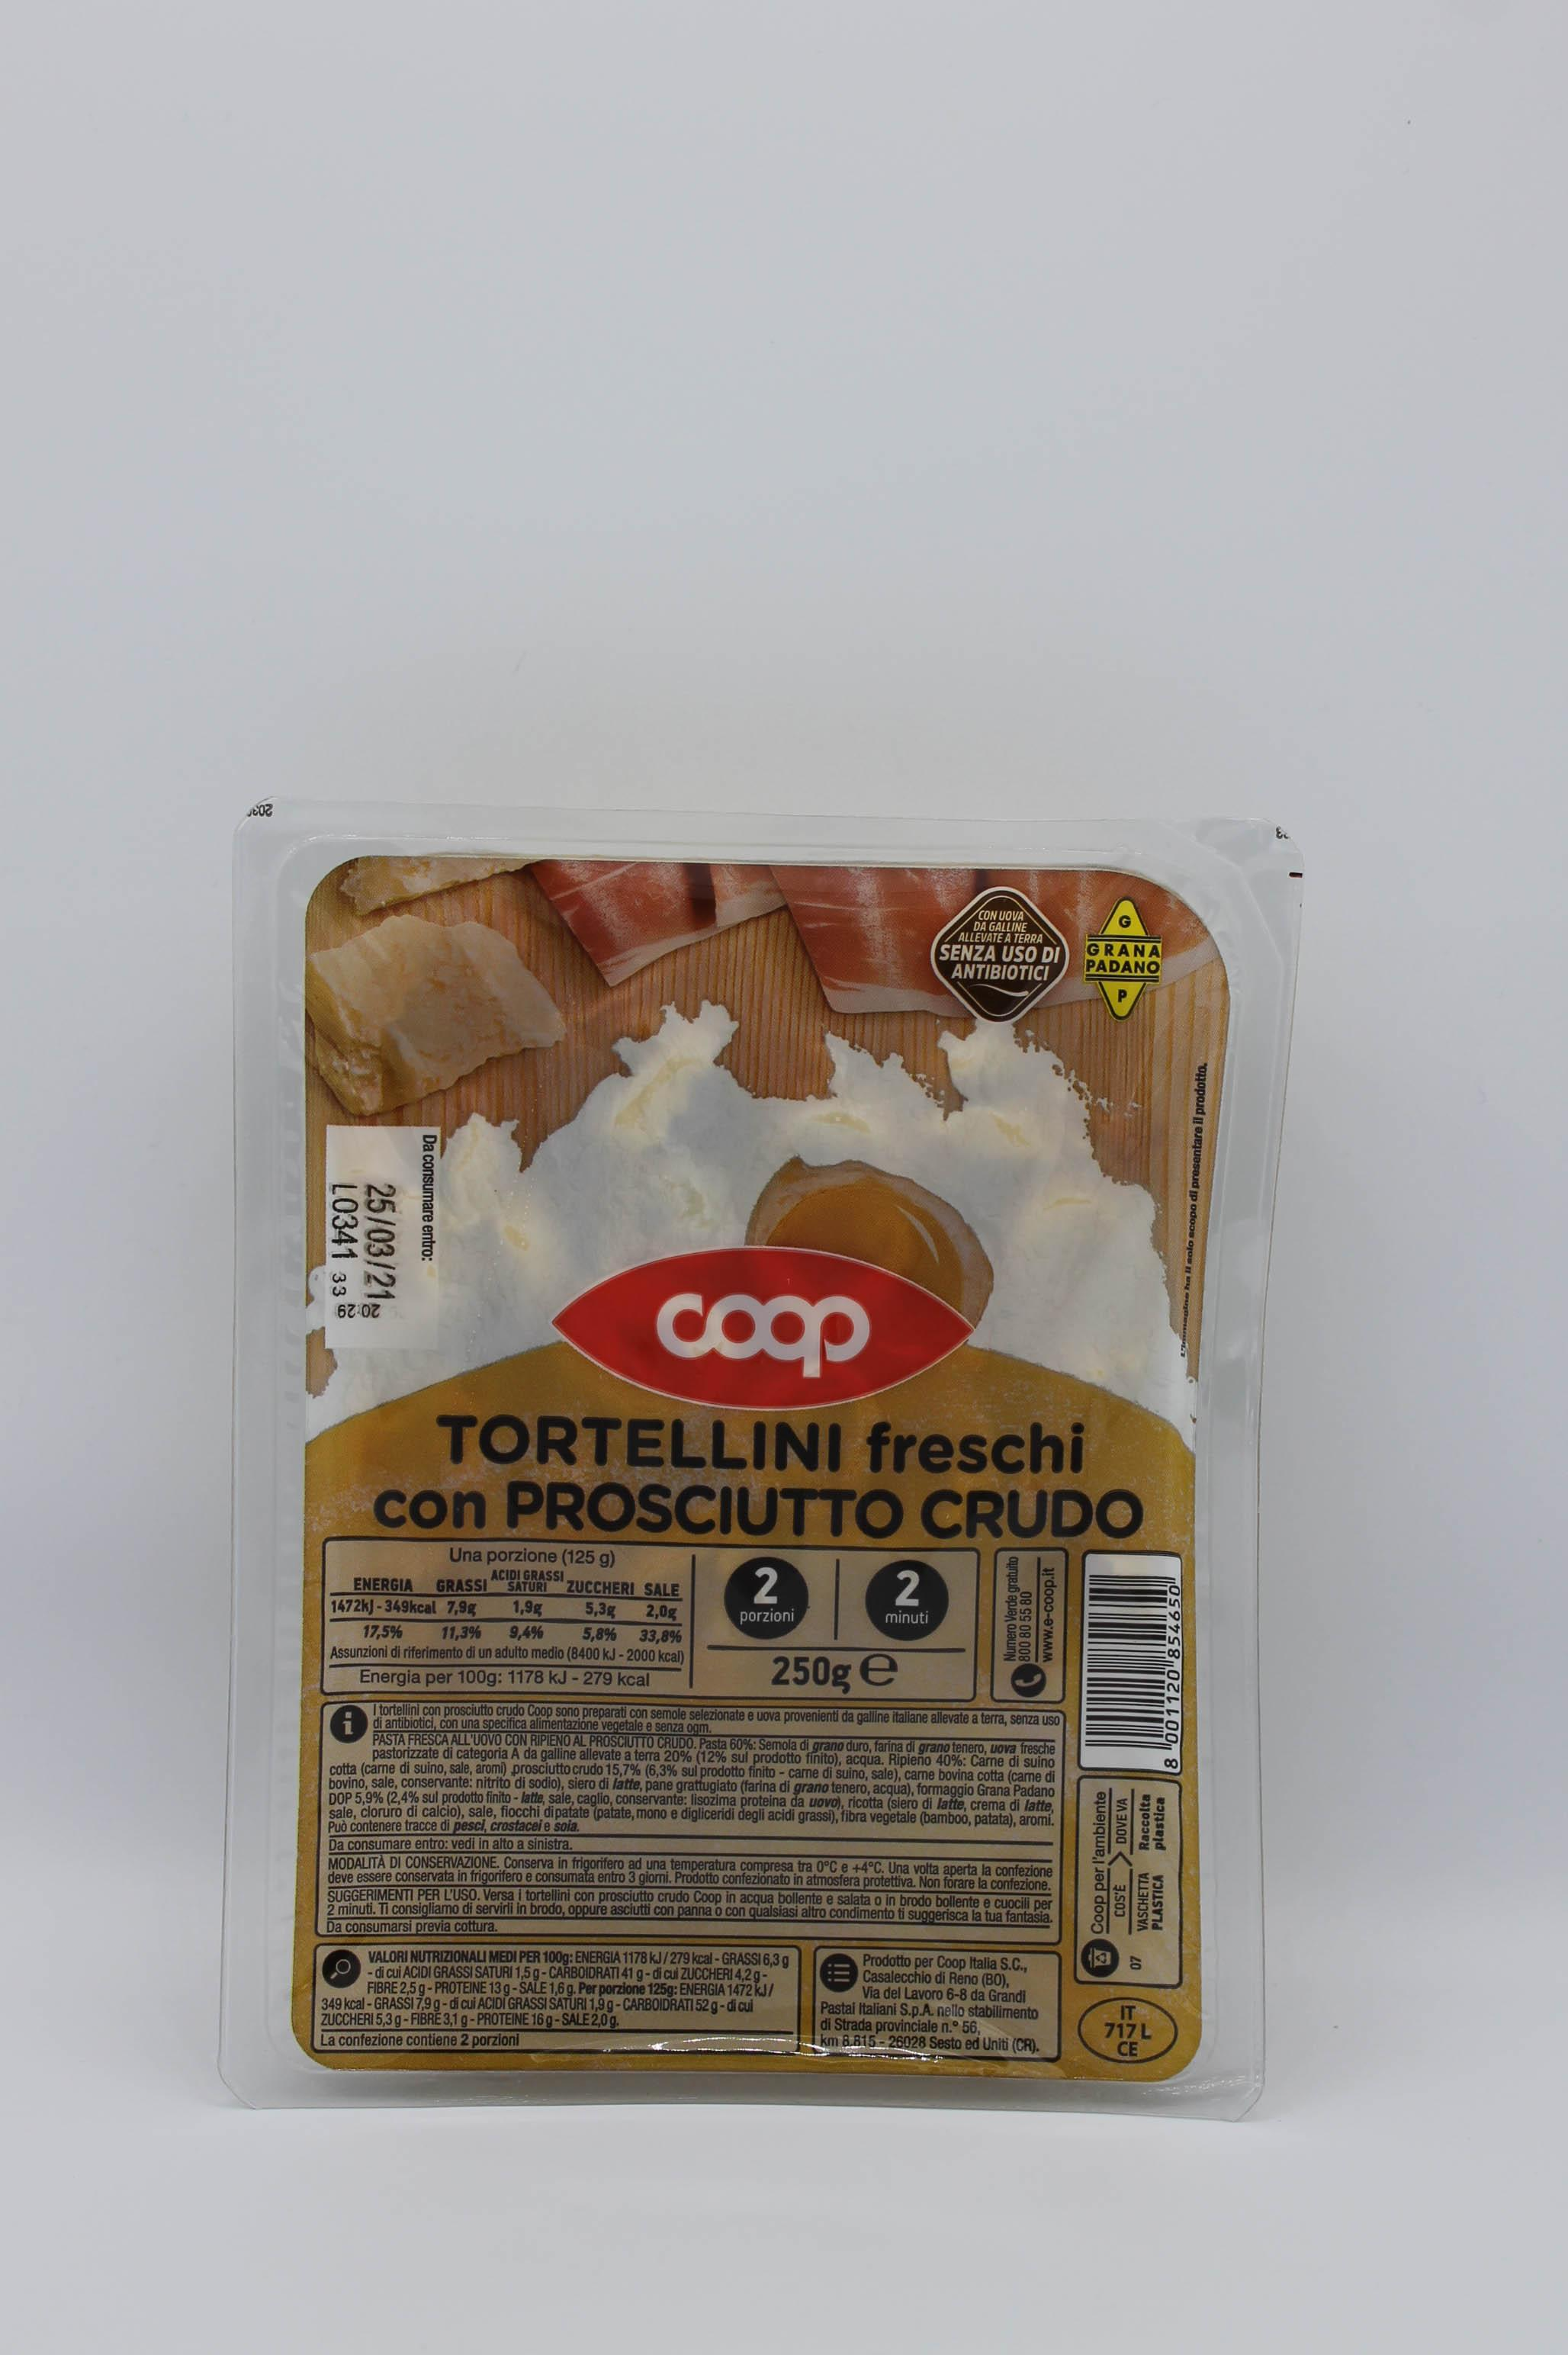 Coop tortellini freschi prosciutto crudo 250gr.